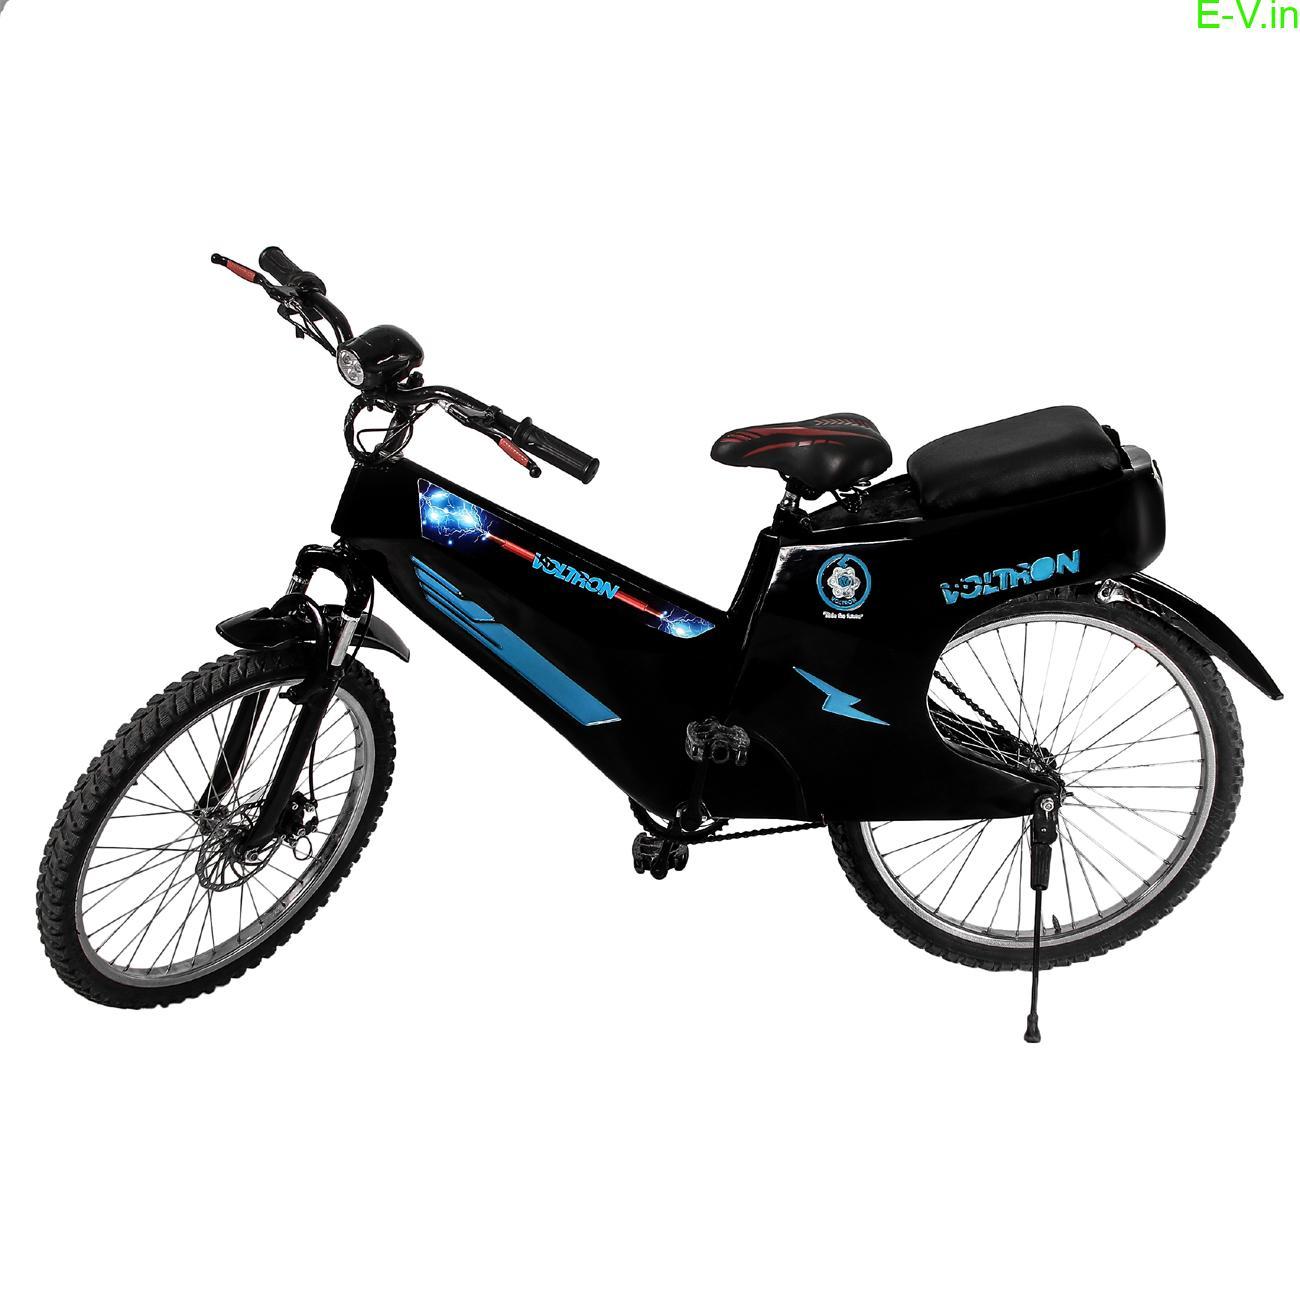 Voltron VM 100 electric cycle gives 100 km range allows pillion riding